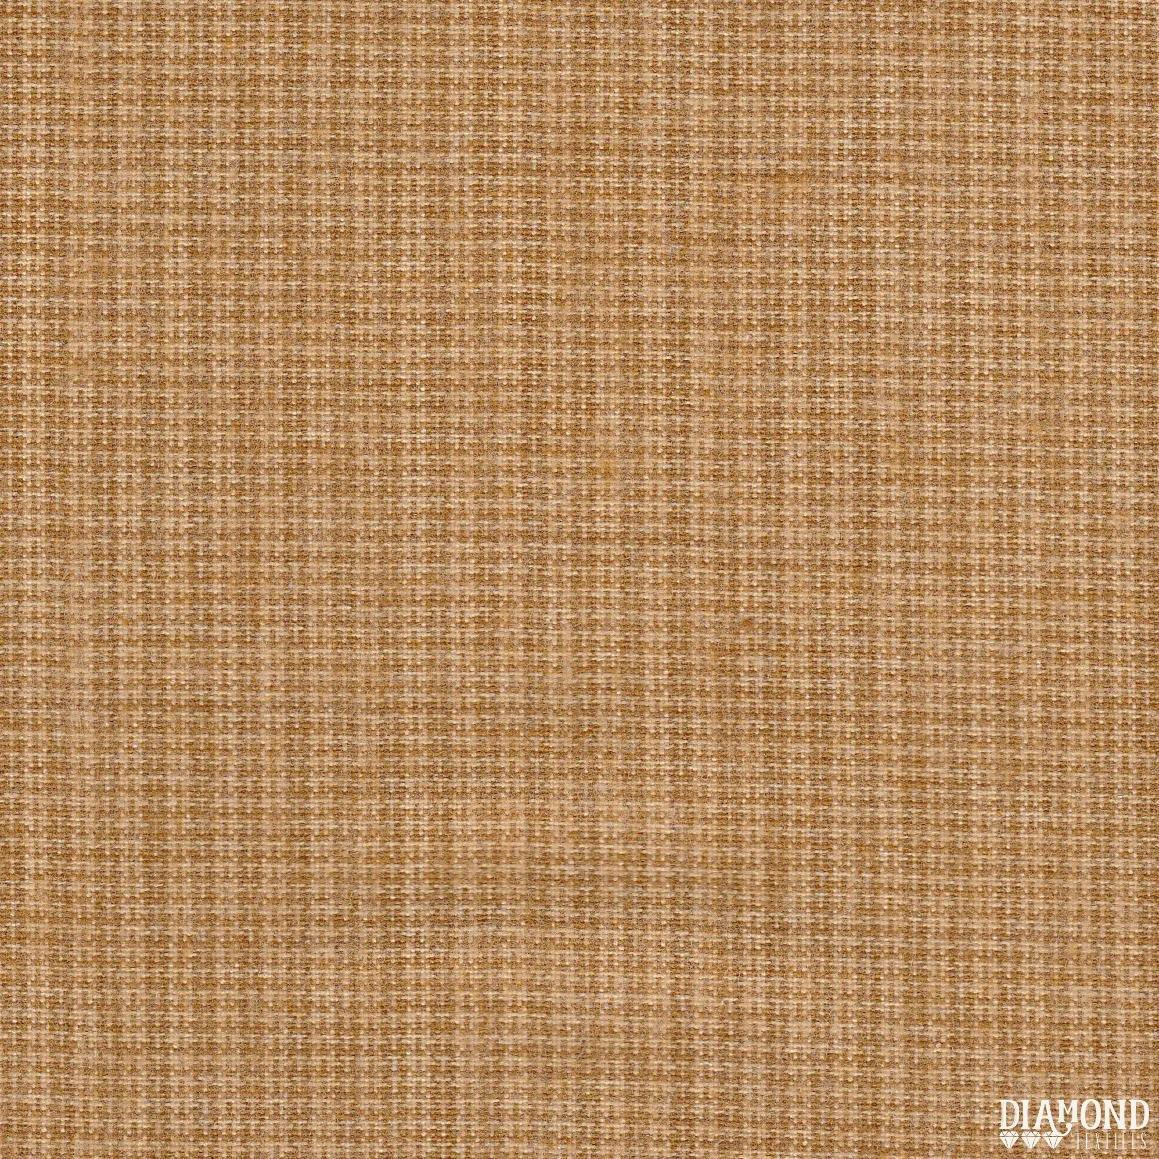 English Garden BRU 2304 Golden by Diamond Textiles